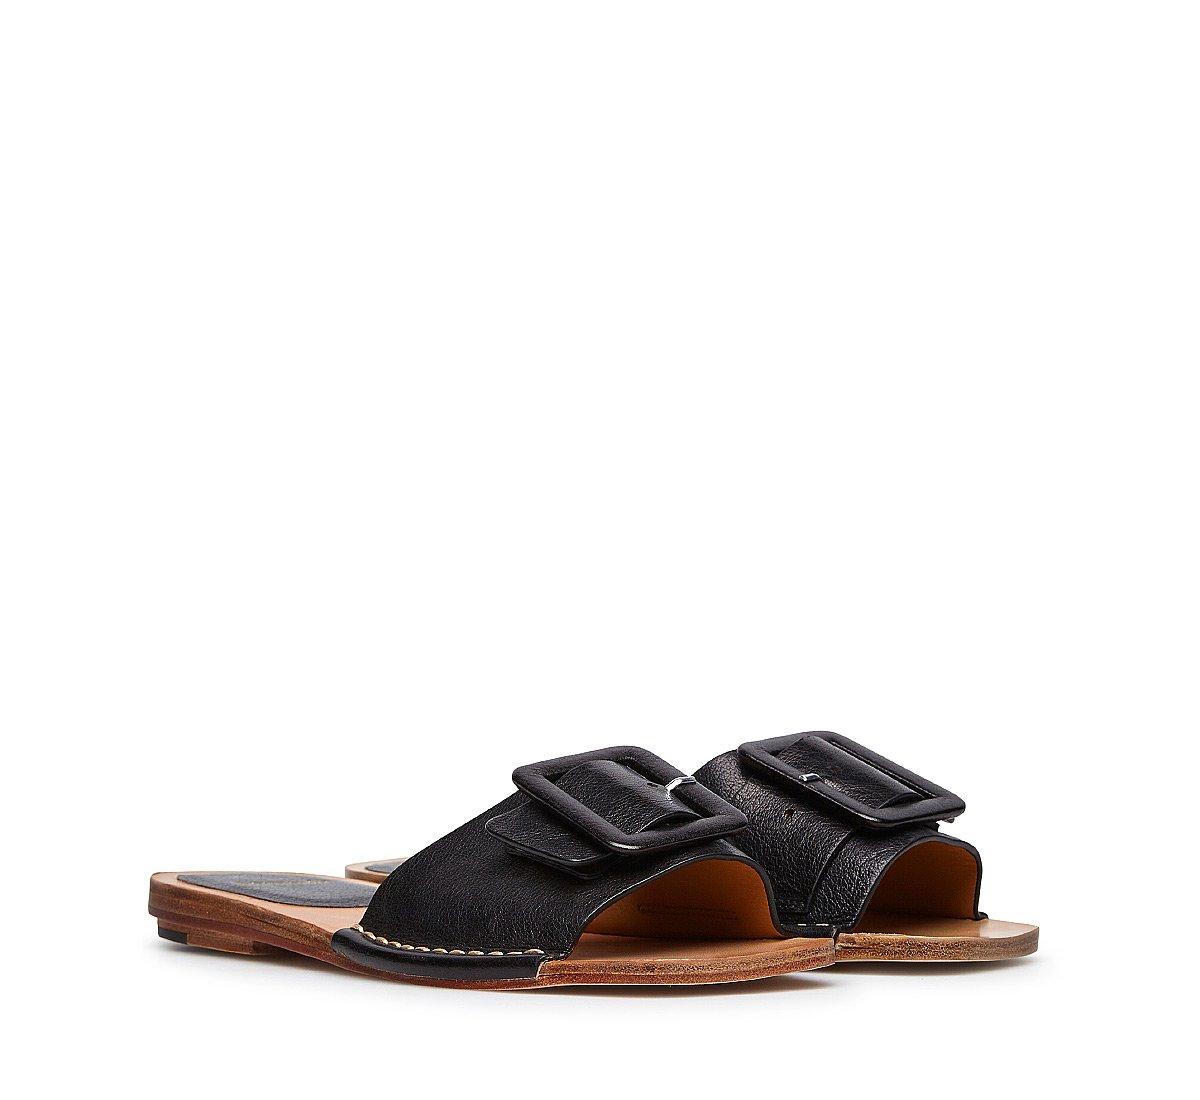 Buffalo leather slipper